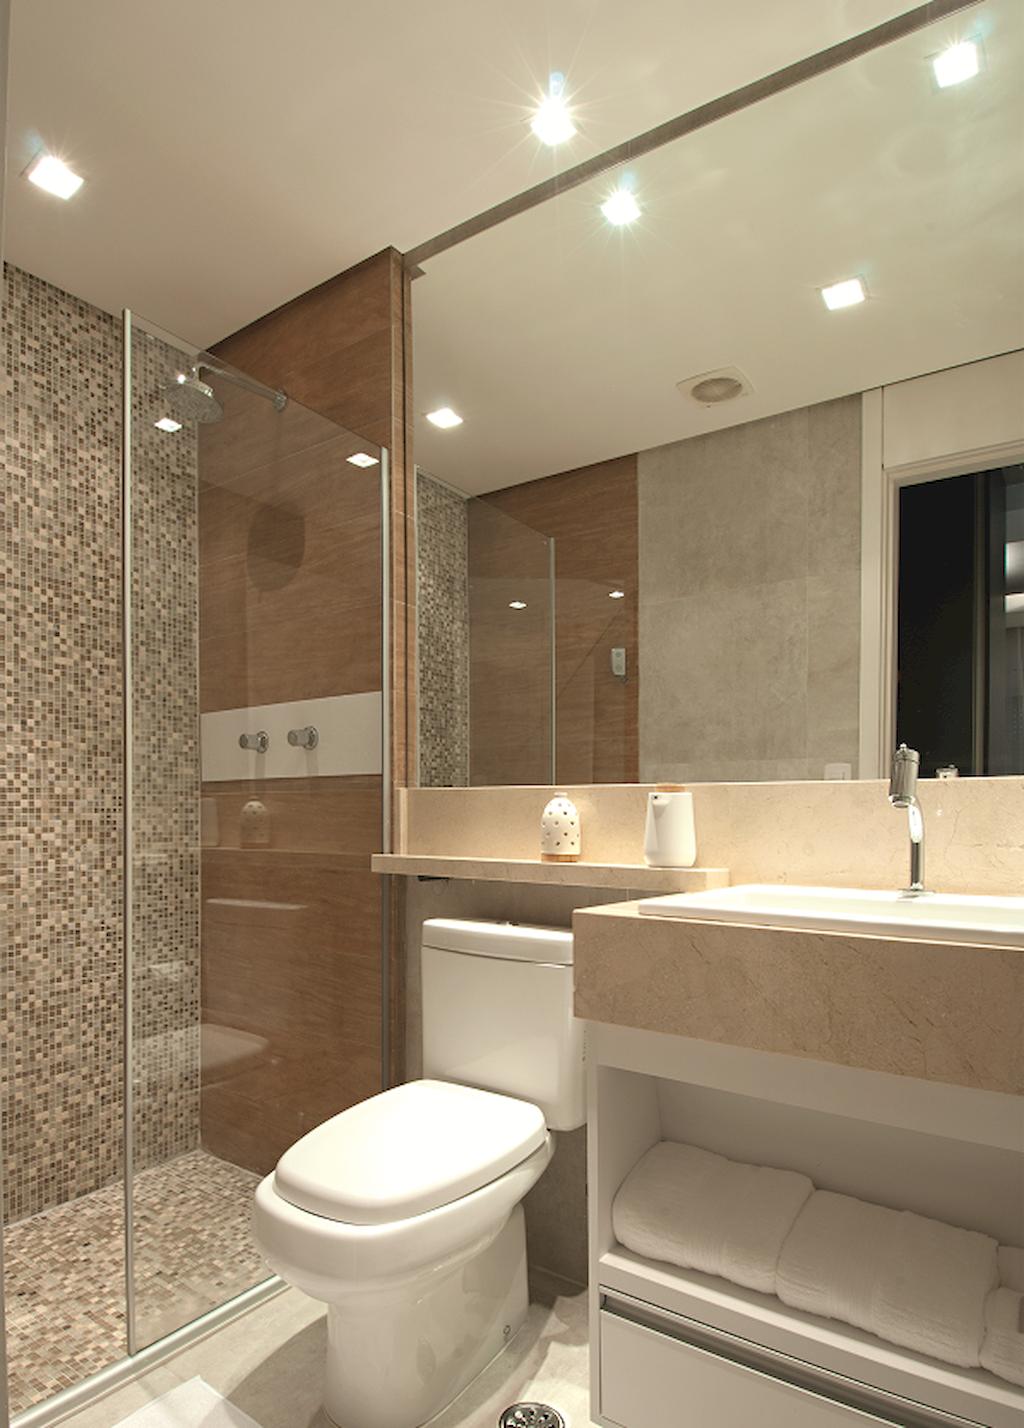 80 cool small bathroom remodel ideas spaciroom com on cool small bathroom design ideas id=33491